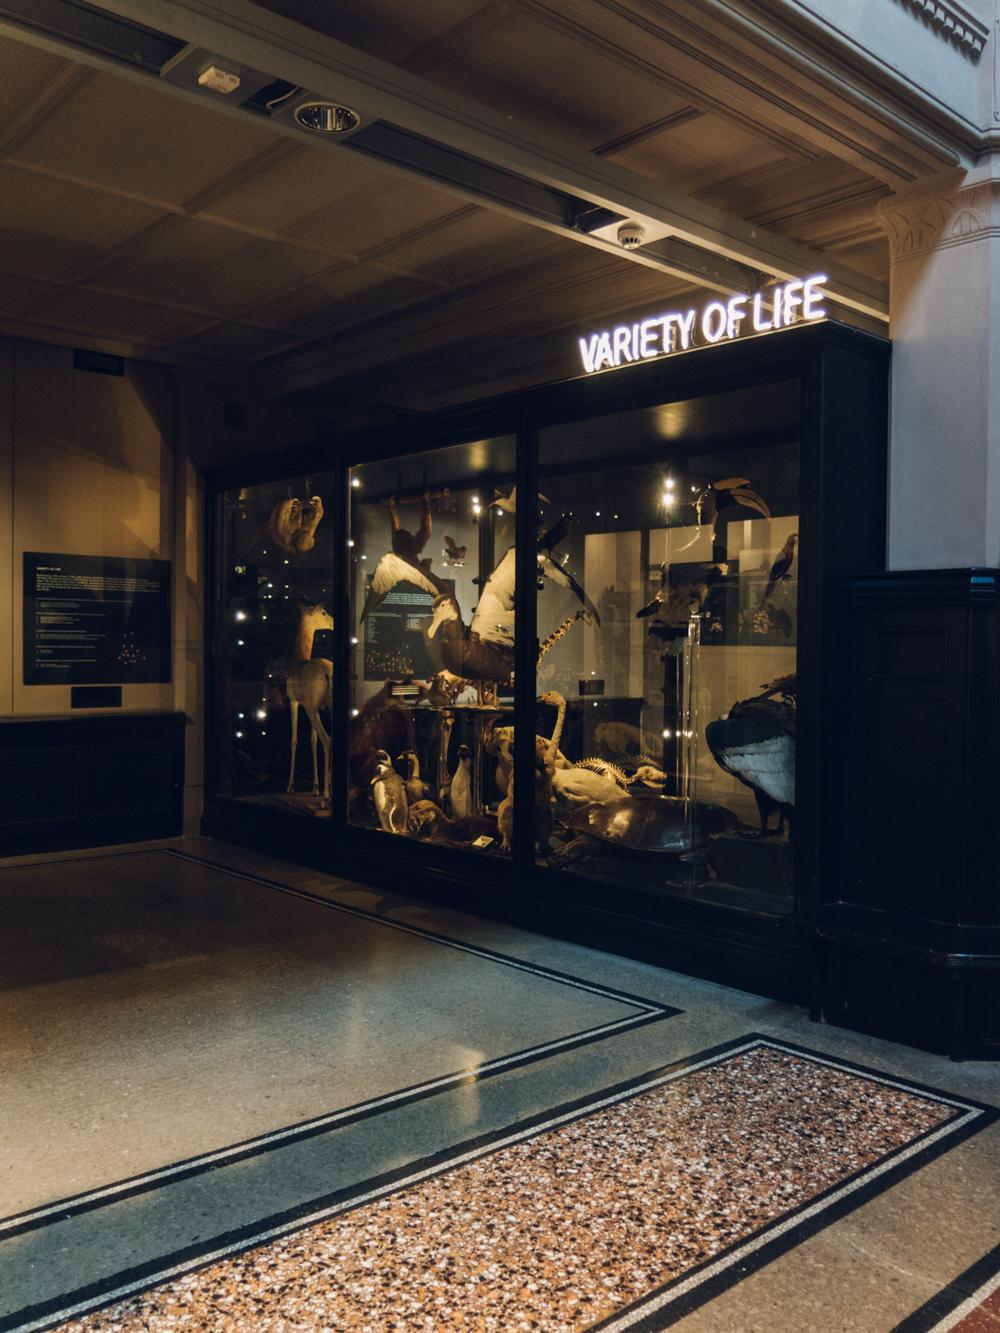 Haarkon Manchester Travel Visit England Sunshine Winter Museum Neon Taxidermy